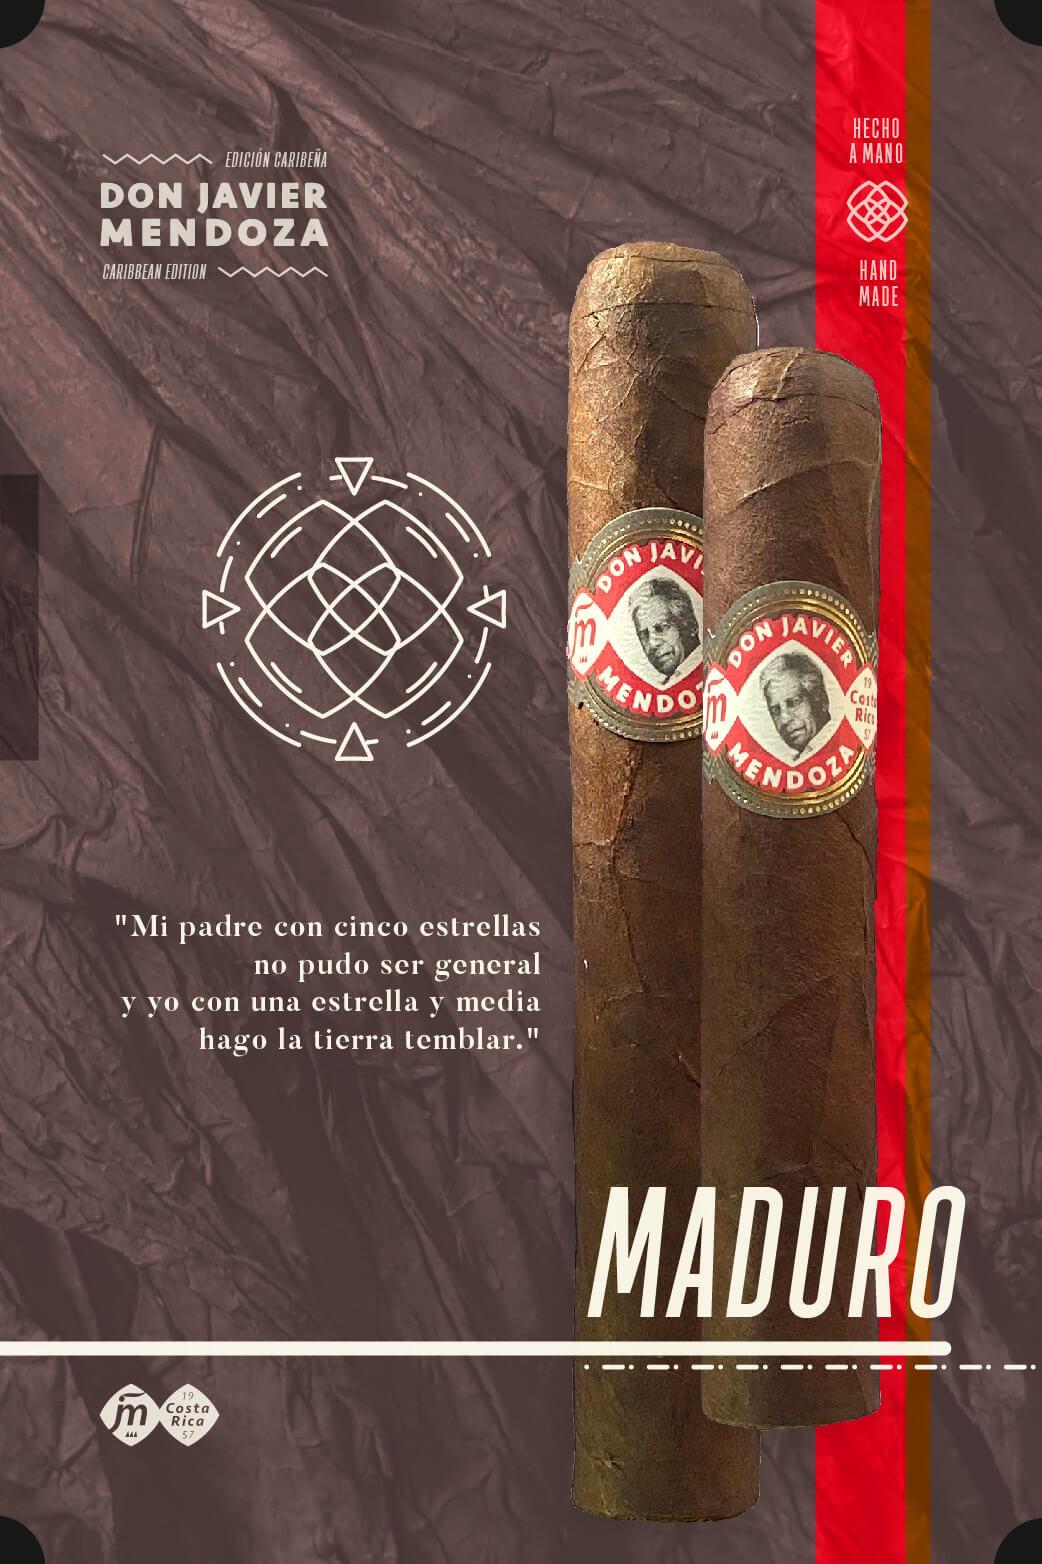 Don Javier Mendoza Maduro